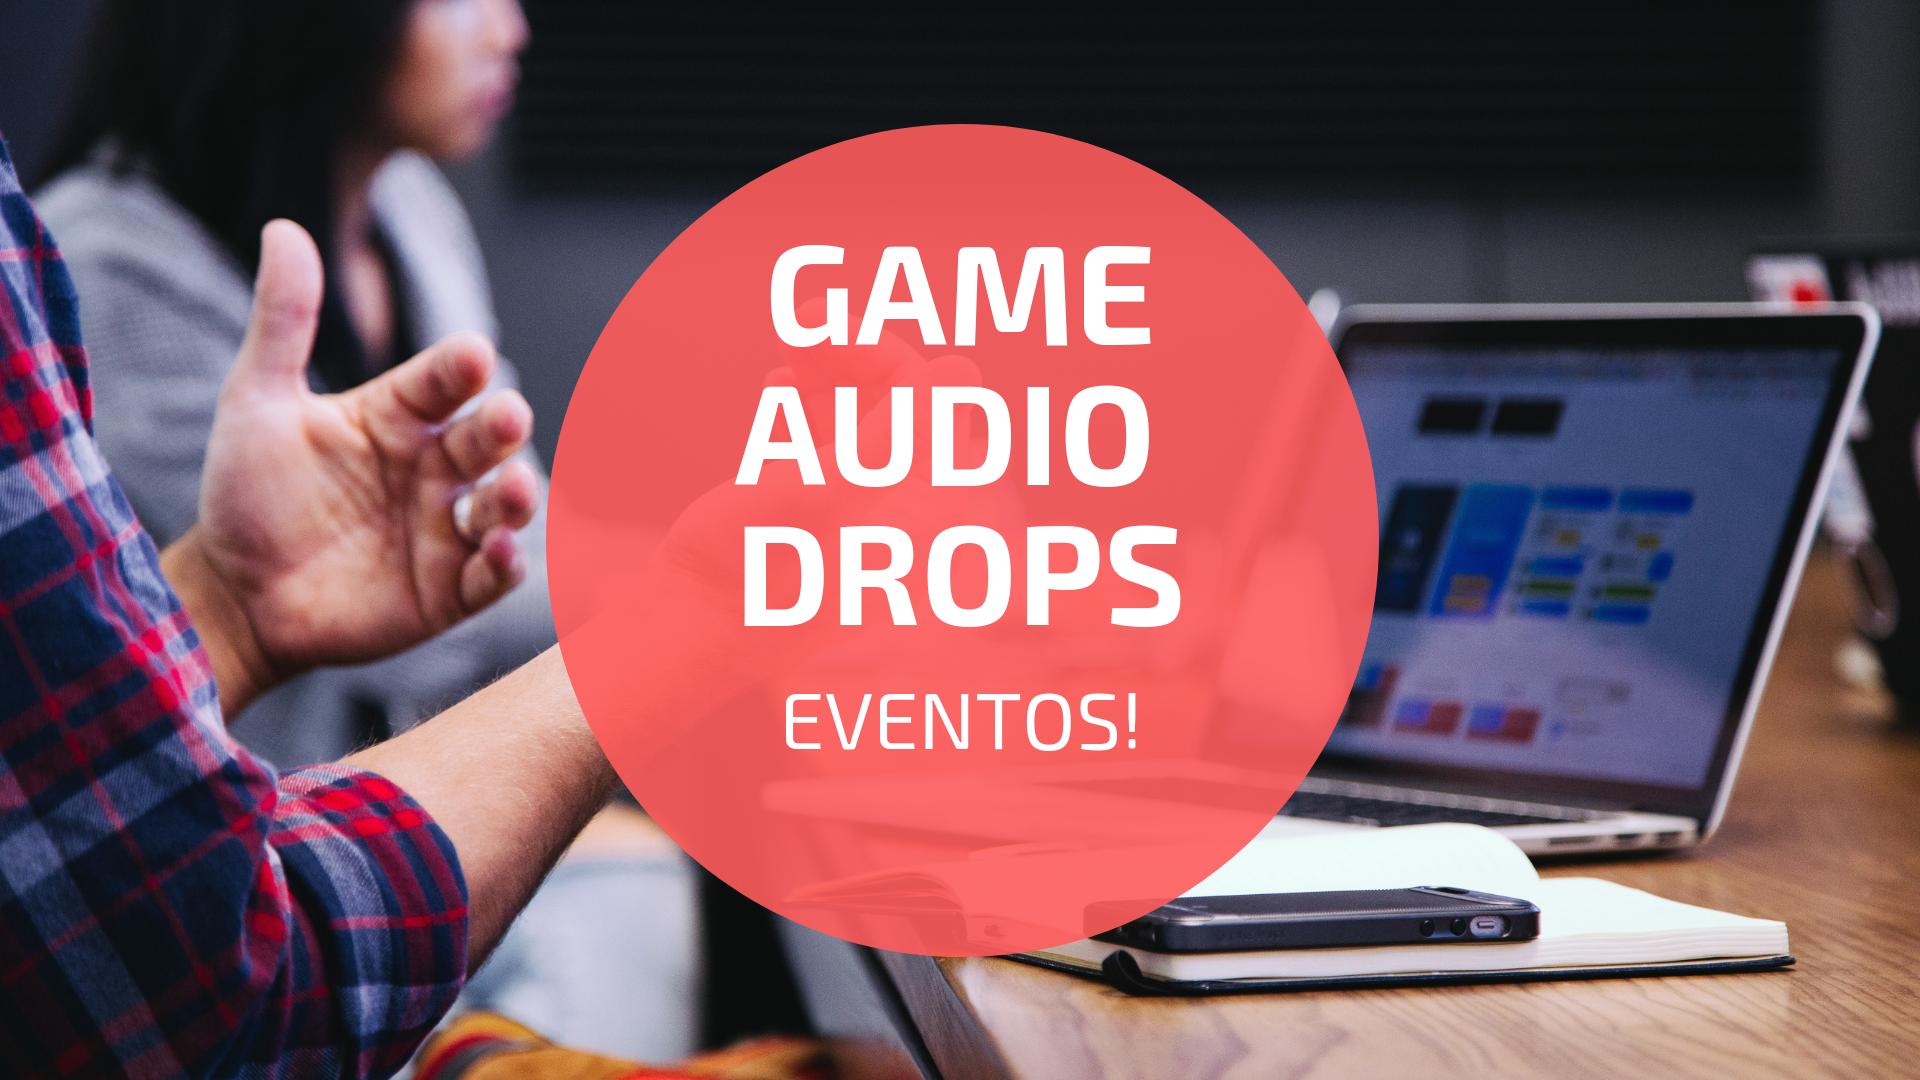 Capa Game Audio Drops Eventos